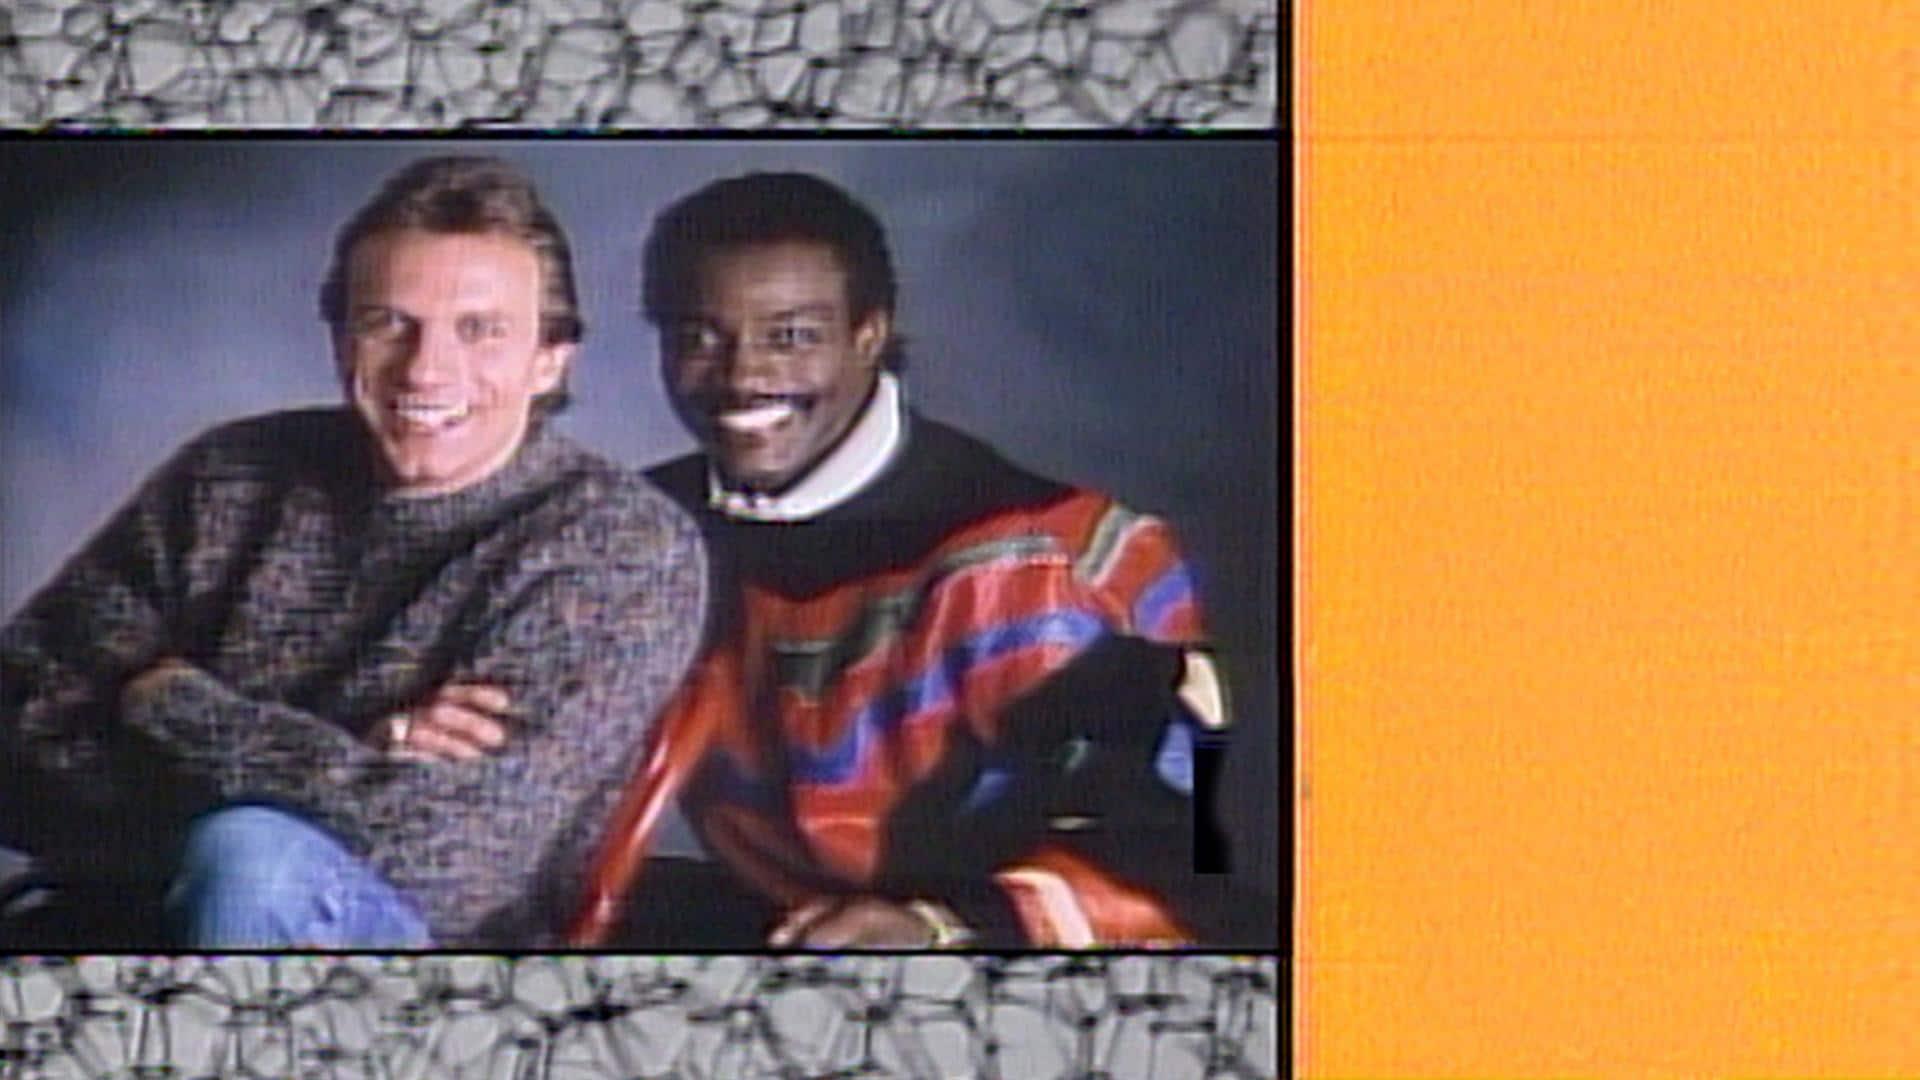 Joe Montana and Walter Payton: January 24, 1987